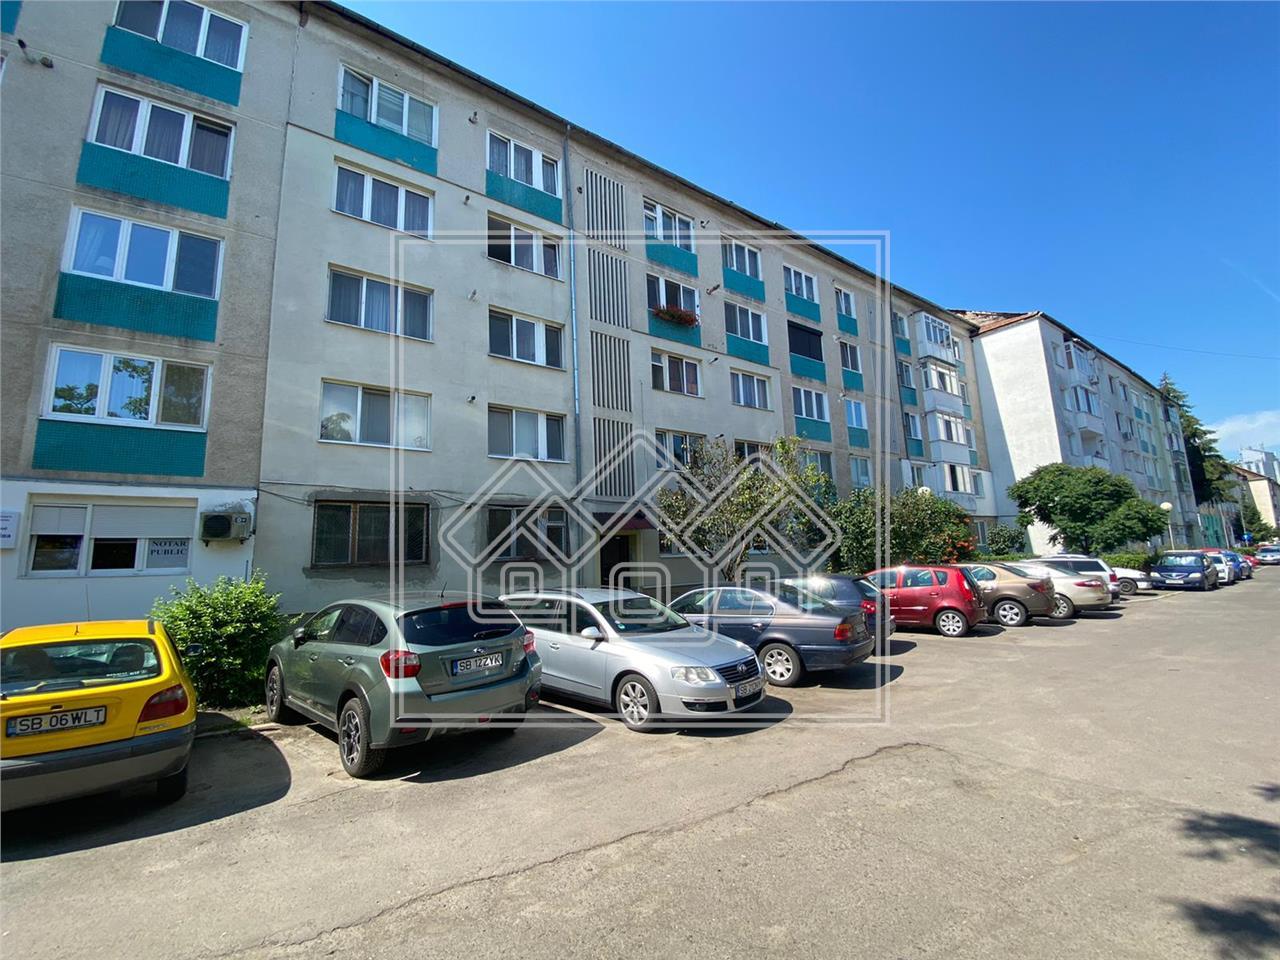 Apartament de vanzare in Sibiu, 3 camere, etaj 1, Zona Milea